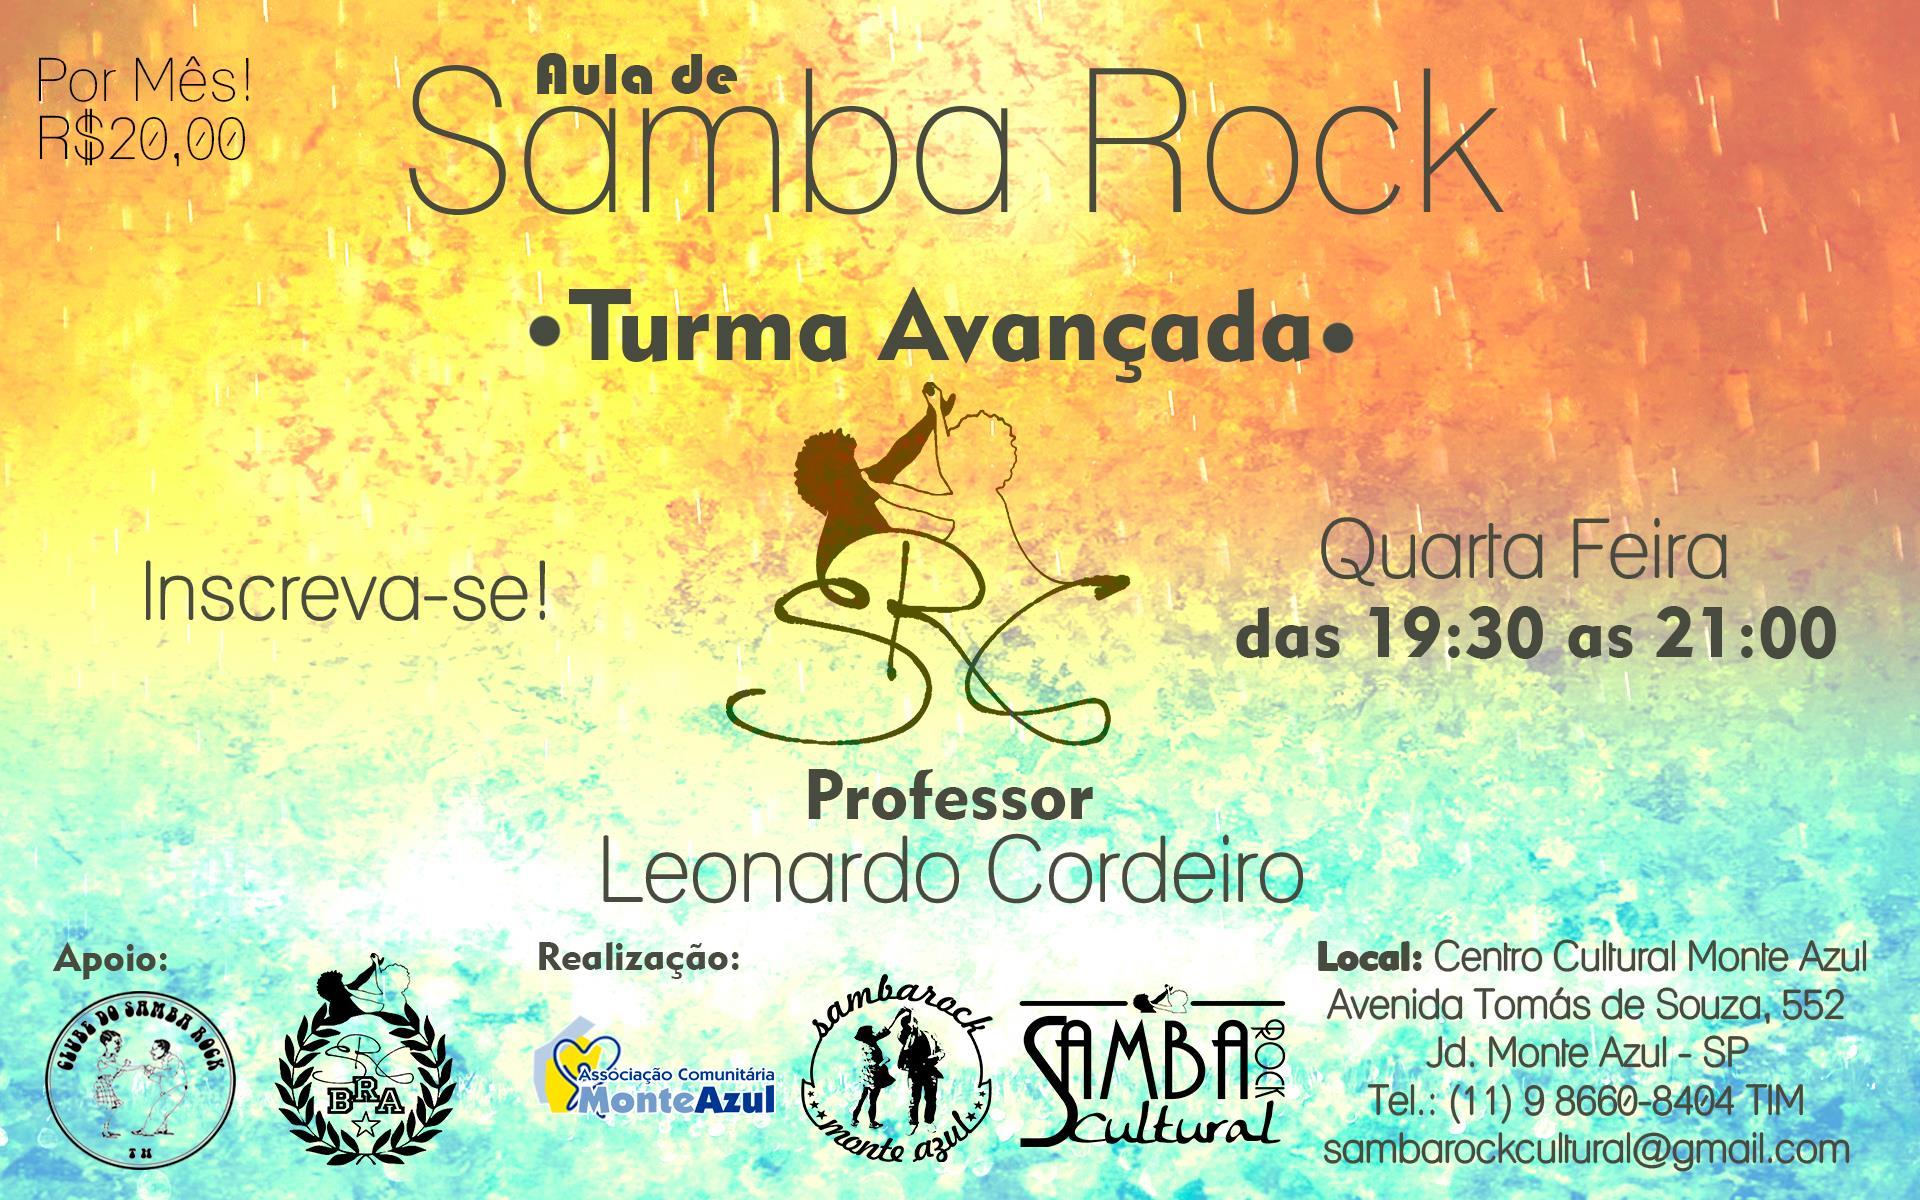 Faça aulas de samba rock no Centro Cultural Monte Azul #nota